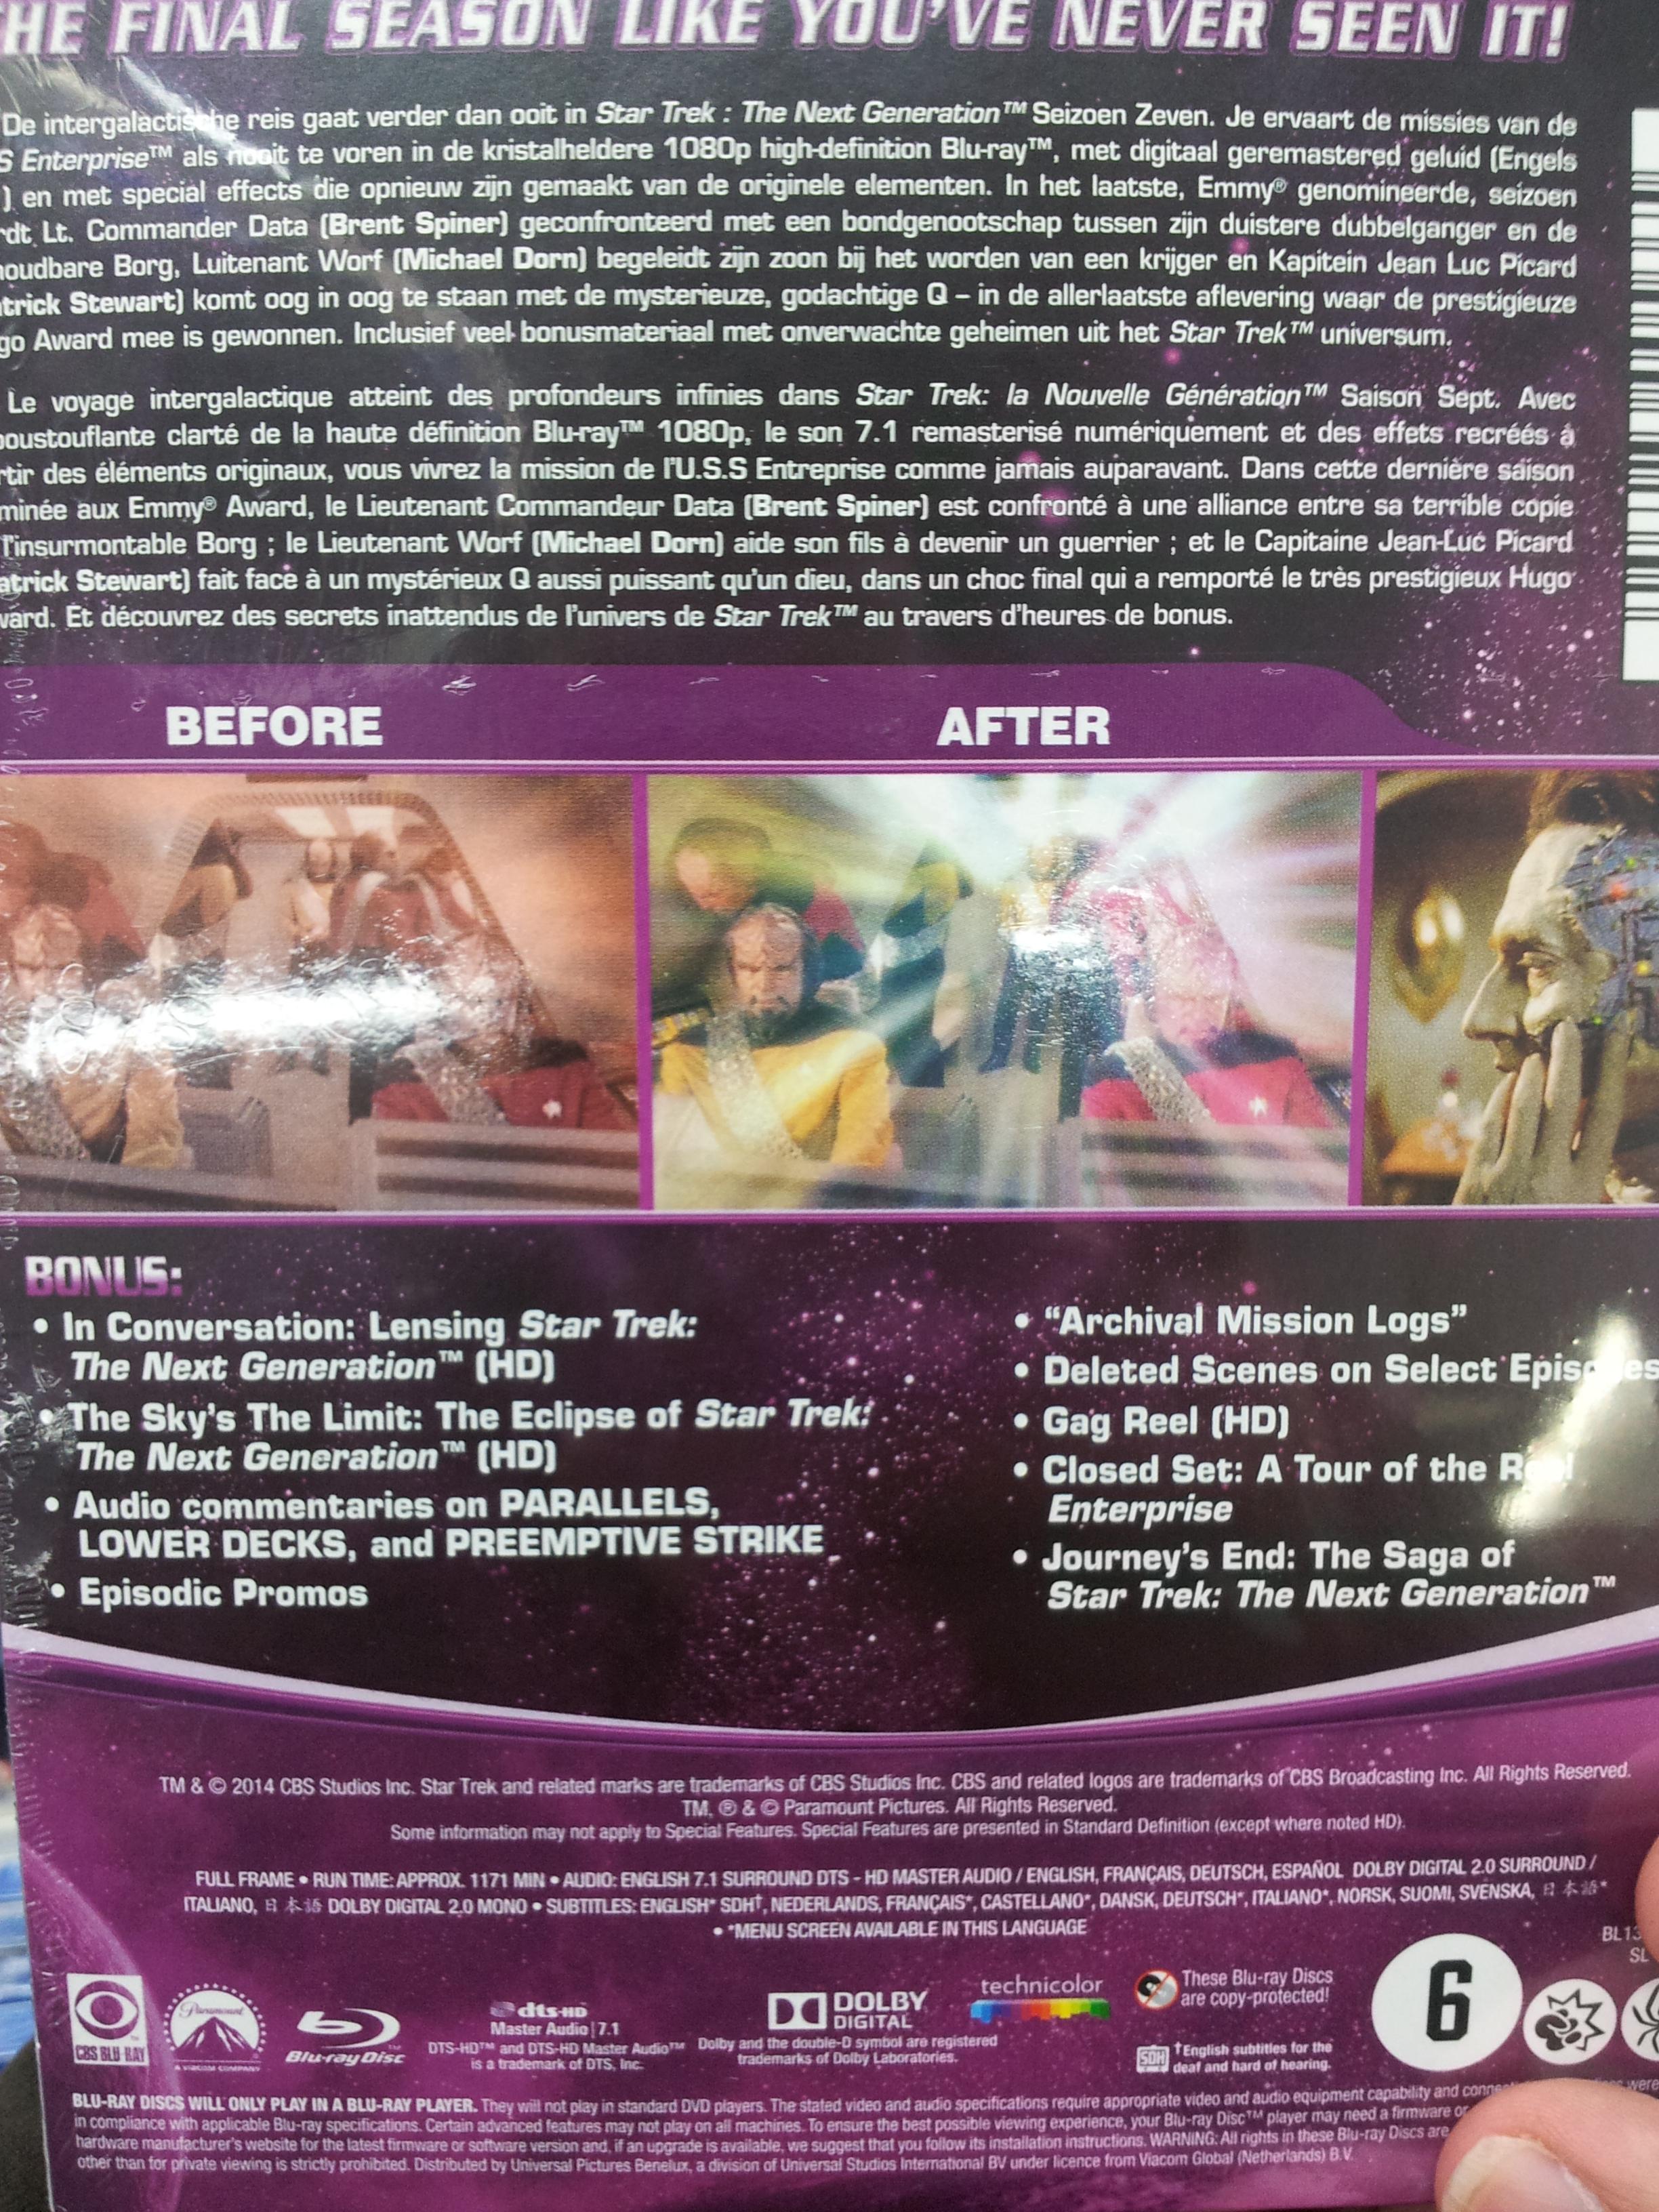 Star Trek TNG Season 7 Blu Ray back of boxset